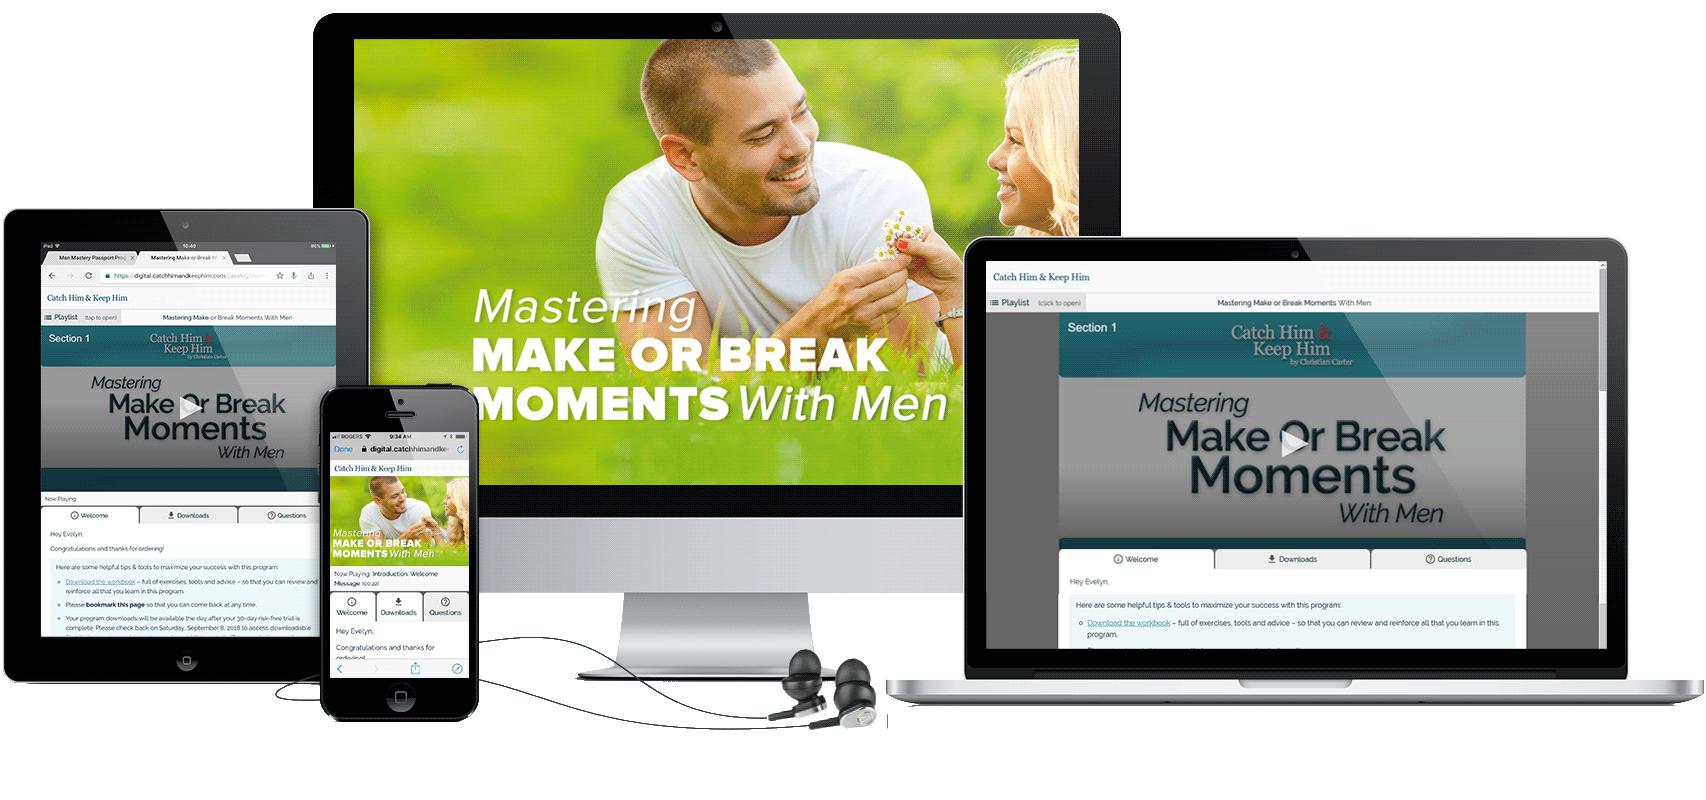 Mastering Make Or Break Moments With Men Program Display